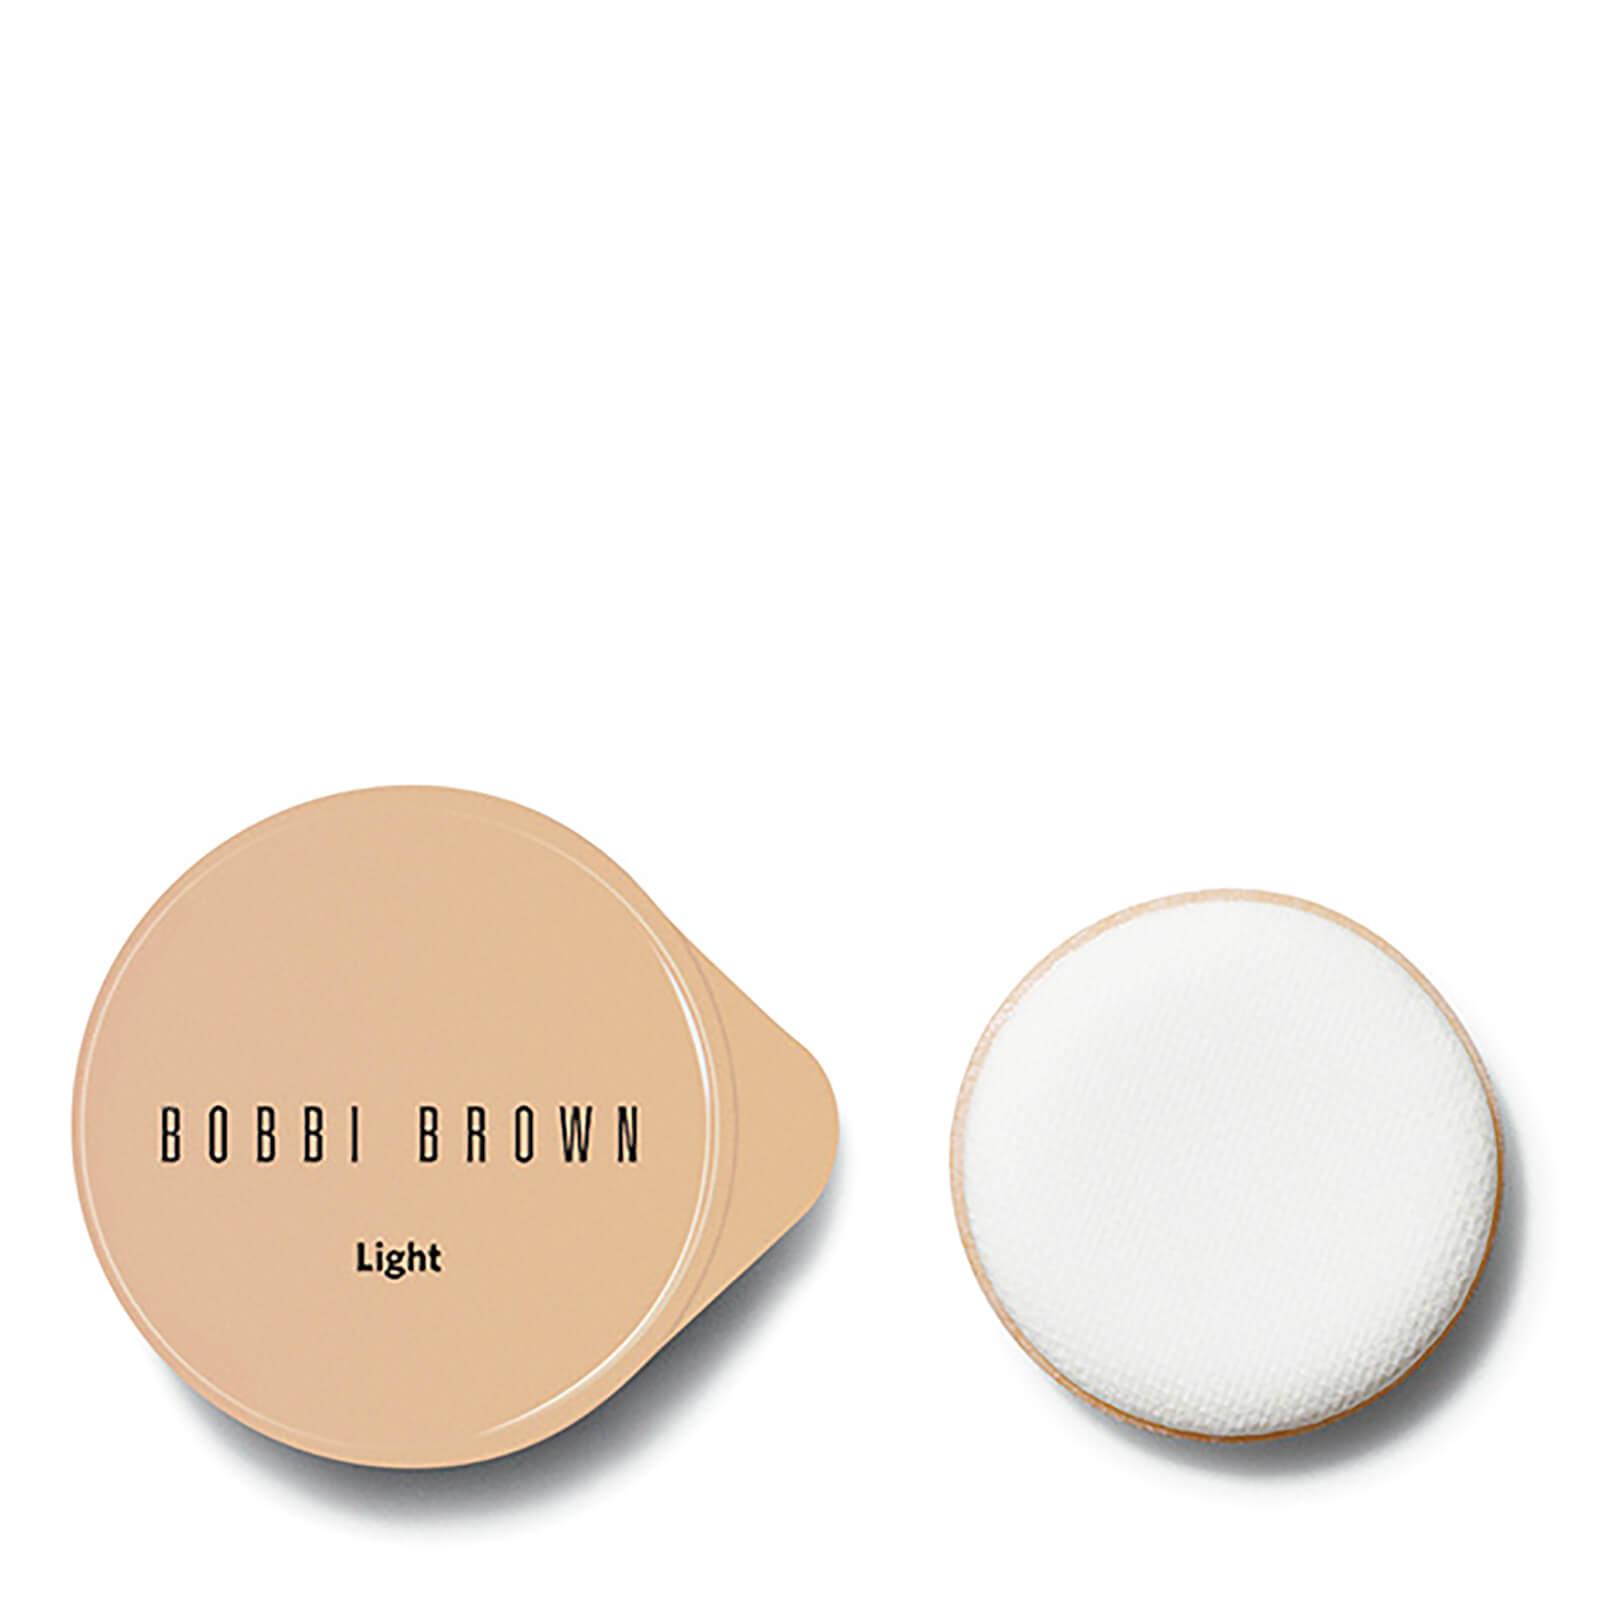 Bobbi Brown Skin Foundation Cushion Compact Spf35 Refill Various Shades